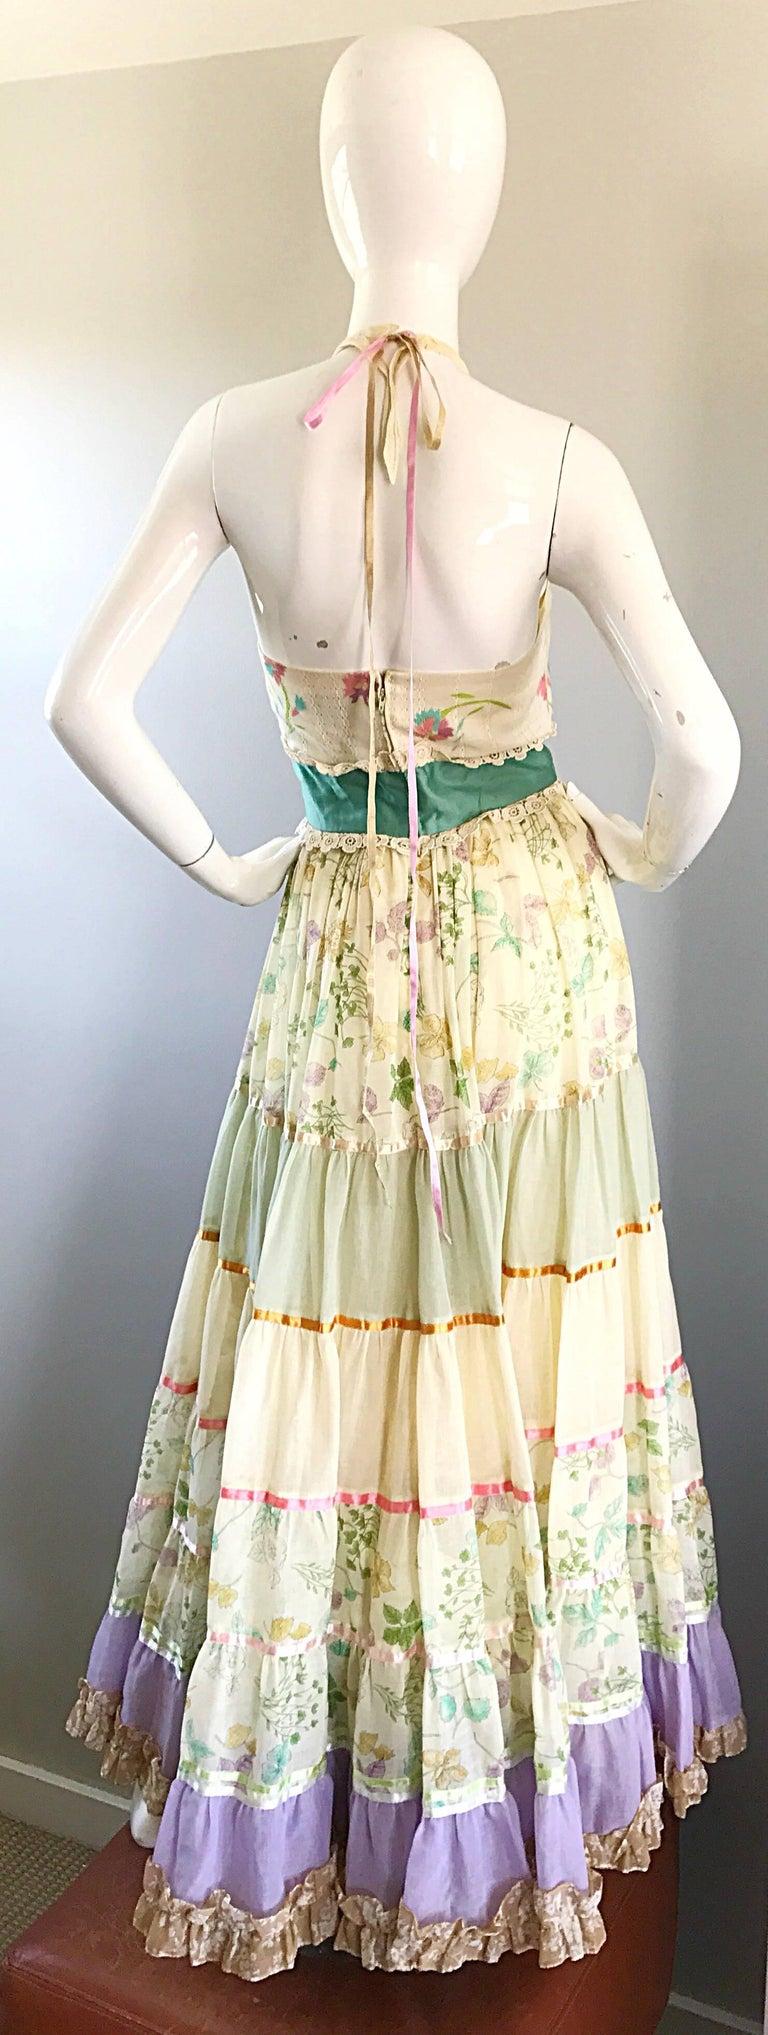 Giorgio di Sant Angelo Colorful Cotton Voile 70s Couture Maxi Dress Gown  In Excellent Condition For Sale In Chicago, IL